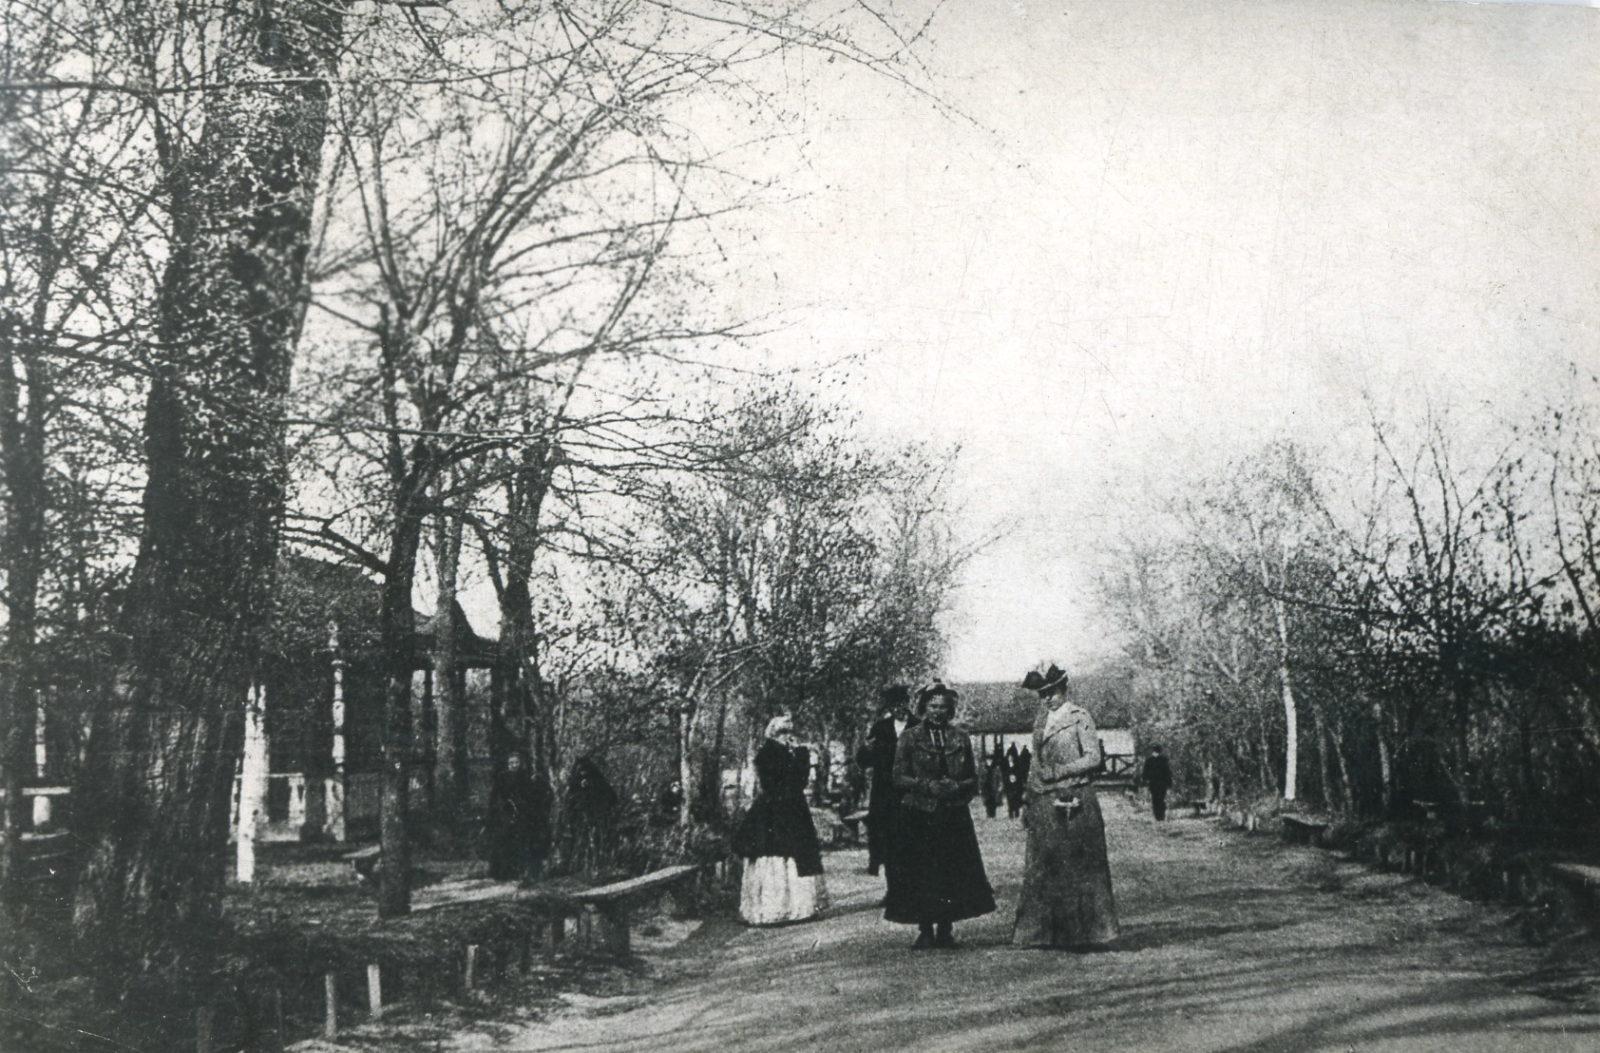 Street scene. Boulevard. Murom, Vladimir Province, Russia